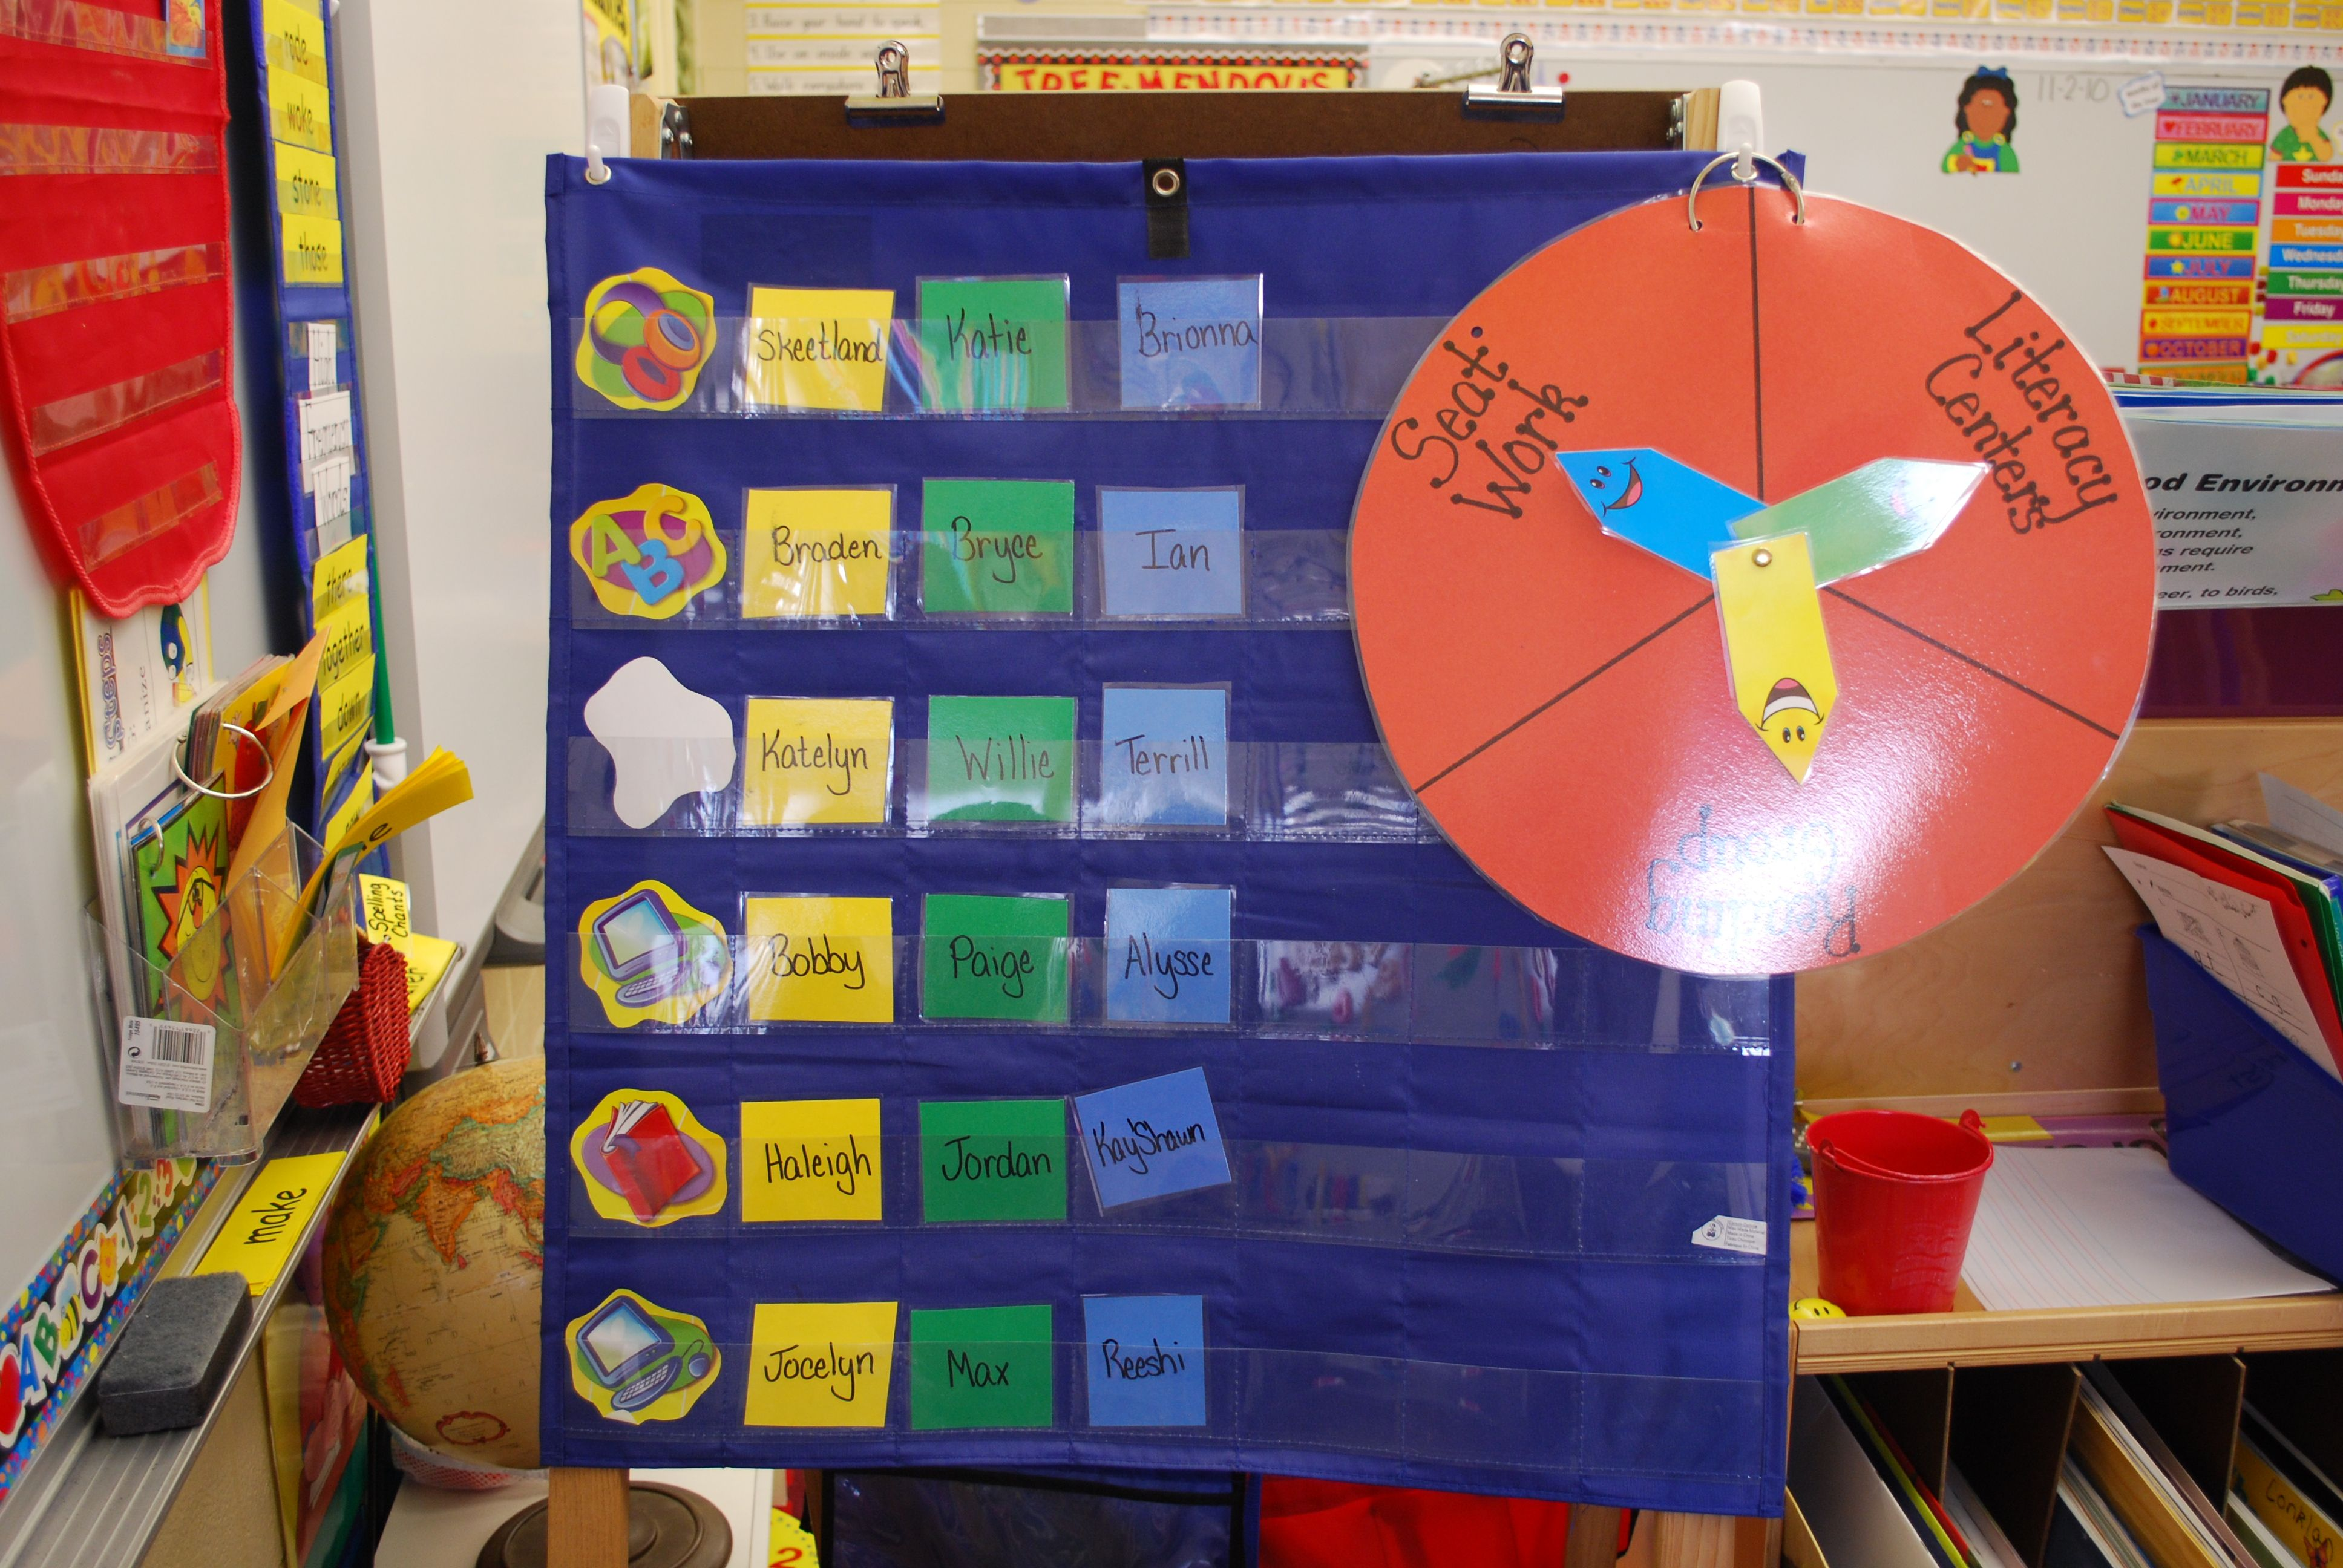 11 29 10 527 Jpg 3 872 2 592 Pixels Classroom Management Preschool Literacy Centers Literacy